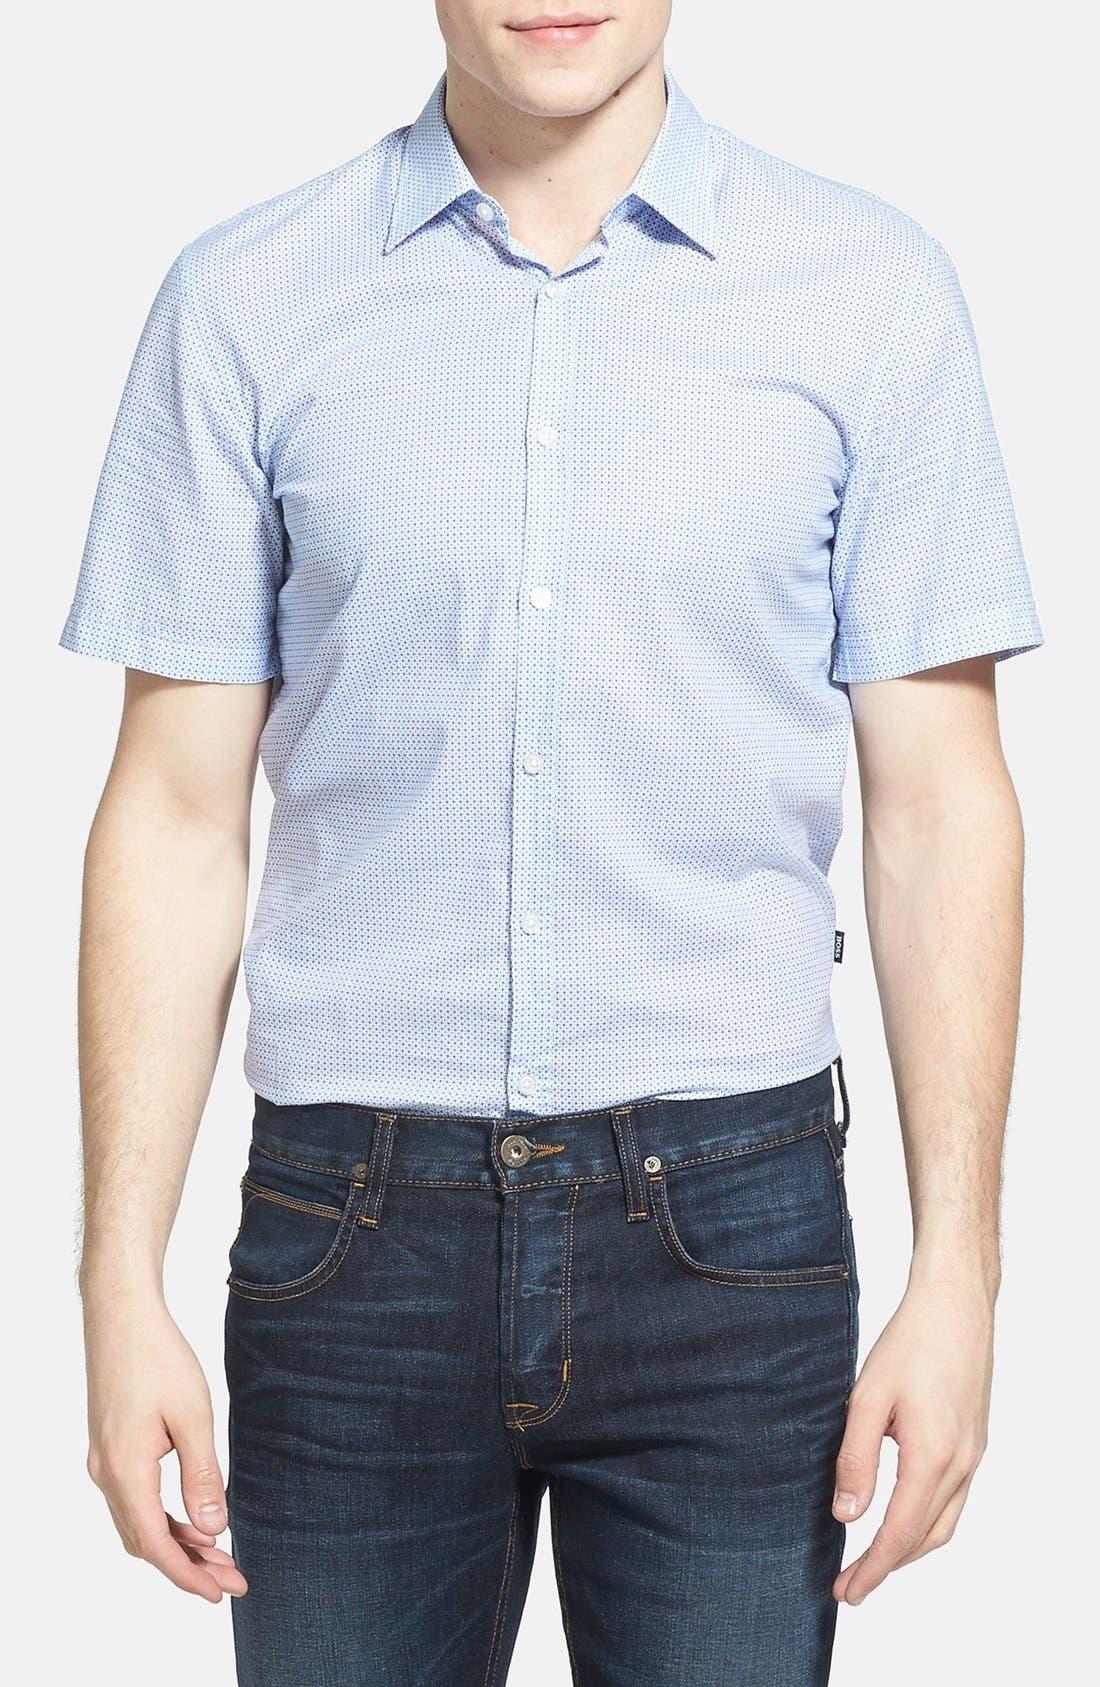 Alternate Image 1 Selected - BOSS HUGO BOSS 'Marco' Slim Fit Short Sleeve Print Sport Shirt